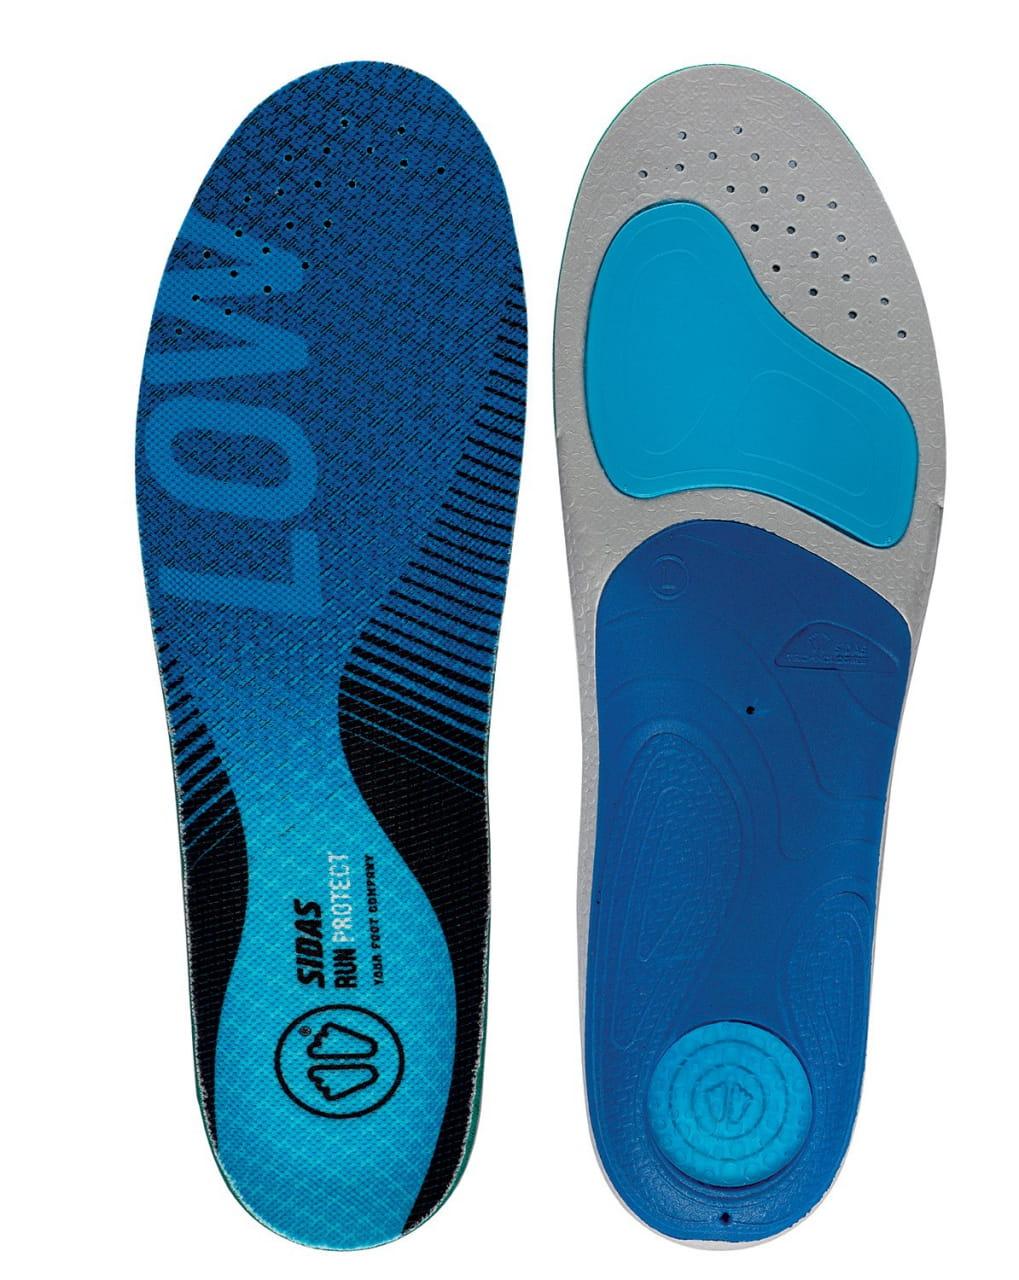 Vložka pro nízkou klenbu chodidla Sidas 3 Feet Run Protect Low